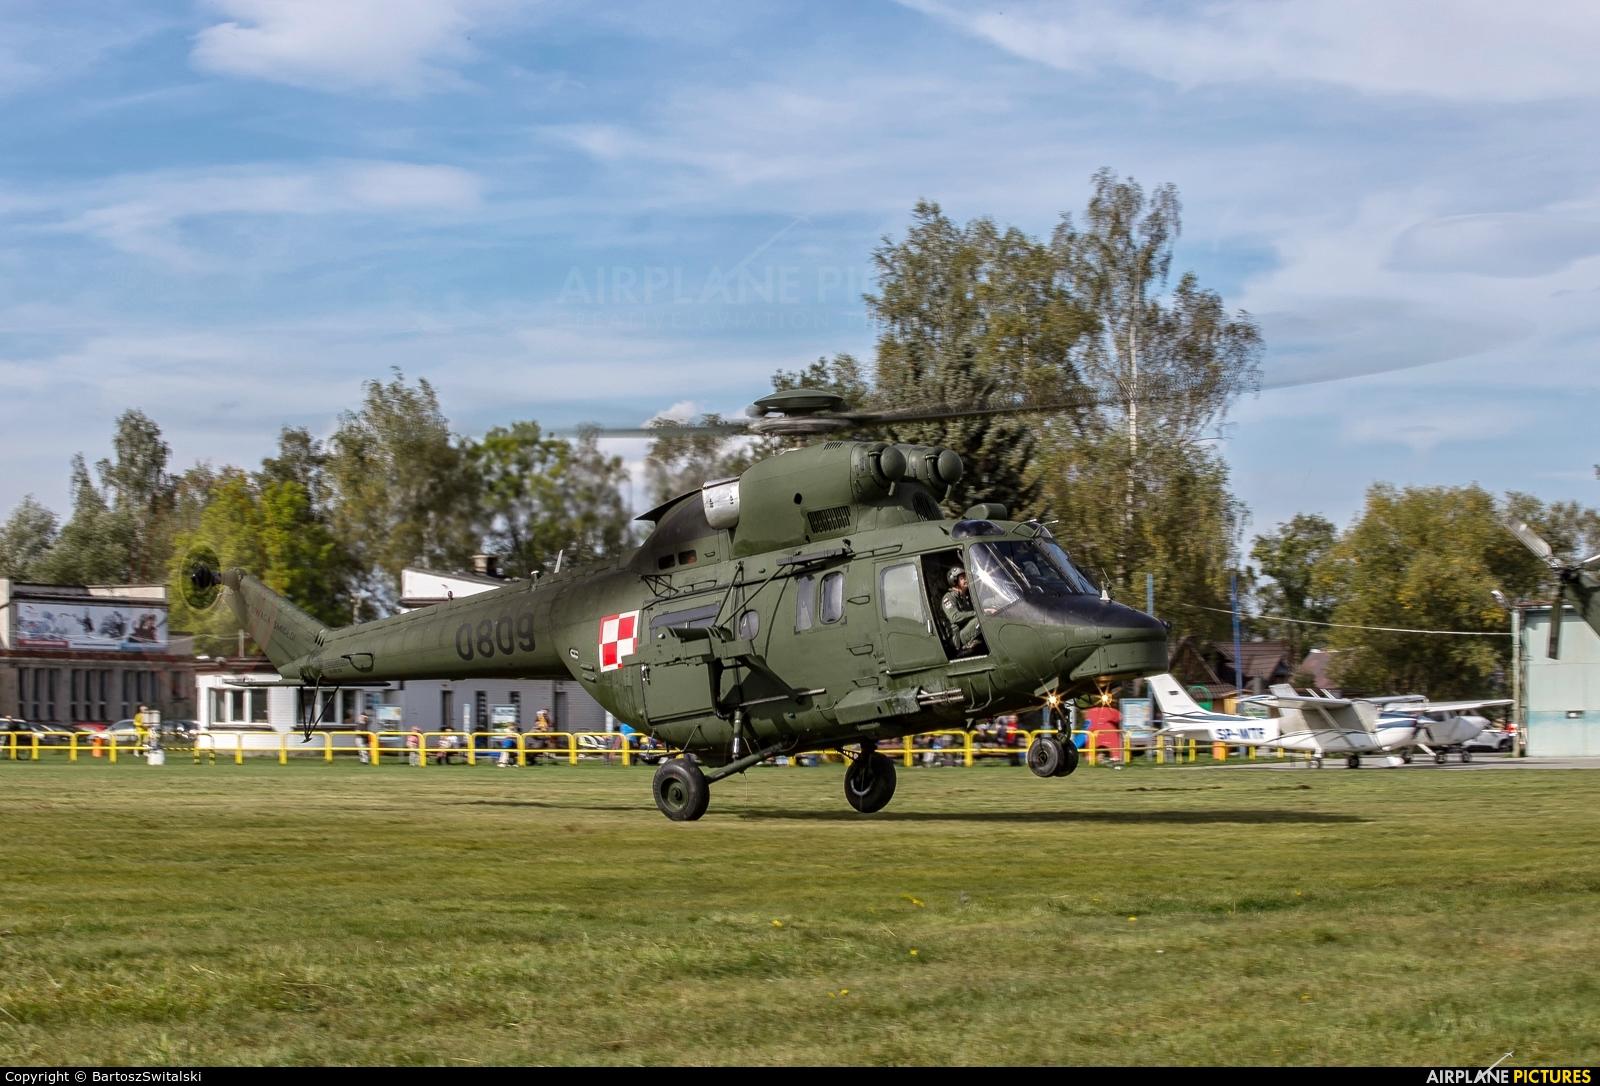 Poland - Army 0809 aircraft at Nowy Targ Airport